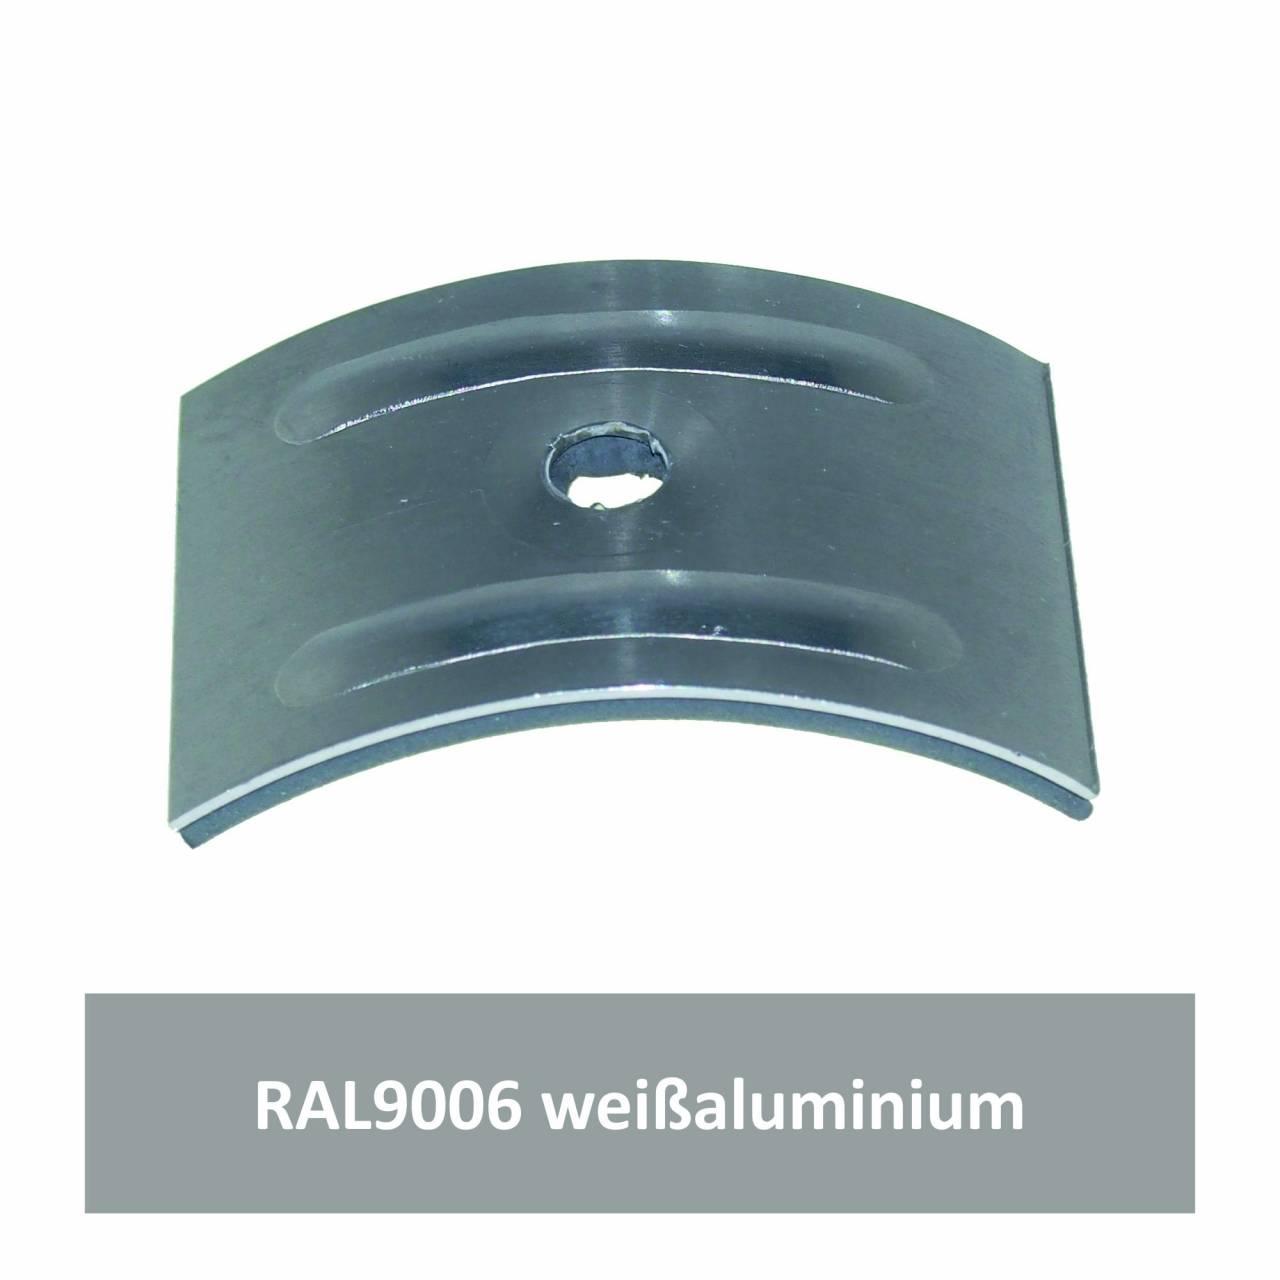 Kalotten für Welle 177/51, Alu RAL9006 weißaluminium / Pck a 100 Stück